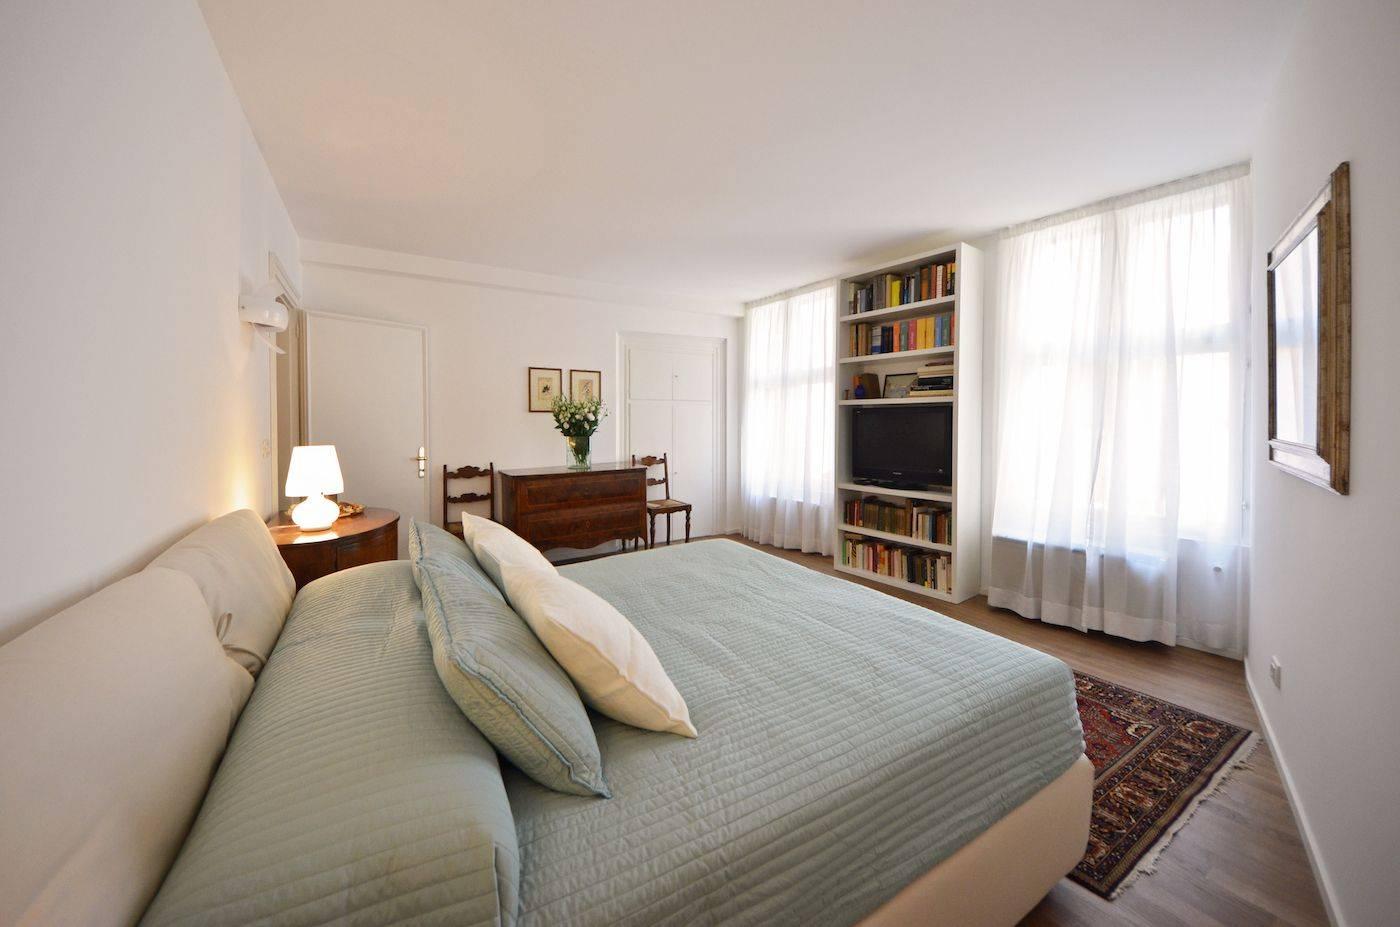 comfortambe king size mattress, parquet flooring and antique furniture